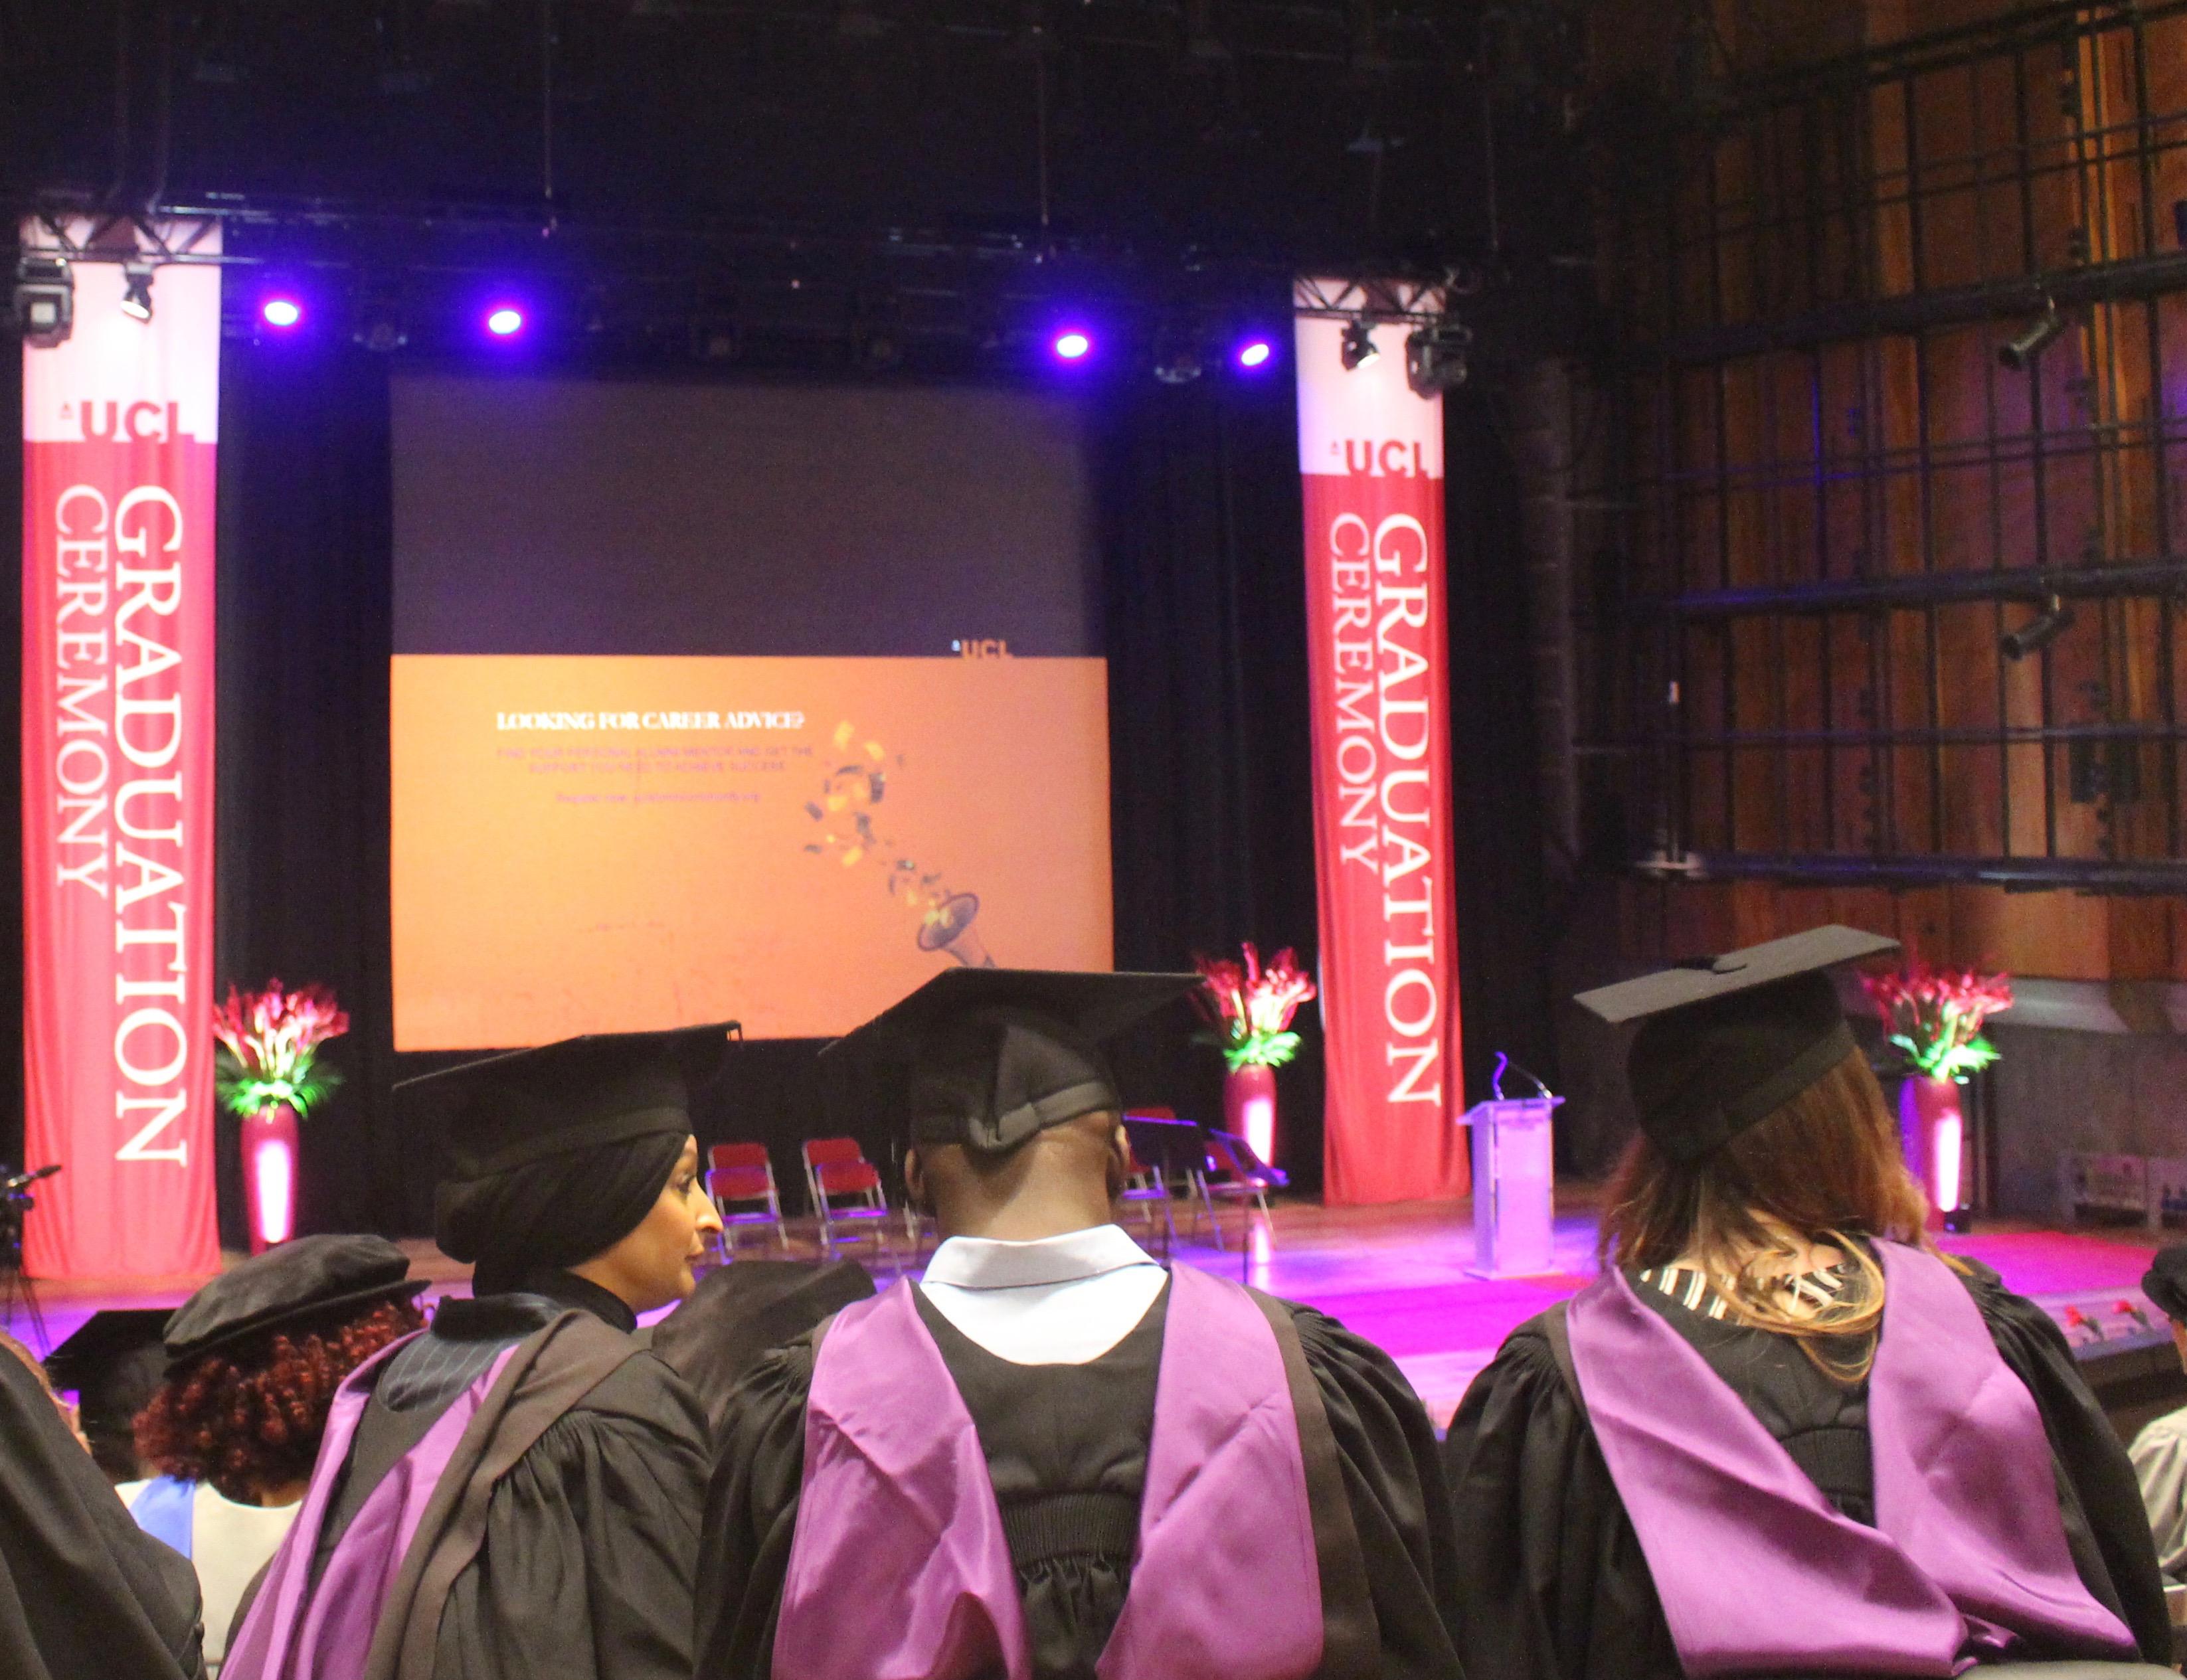 UCL Graduation Ceremony